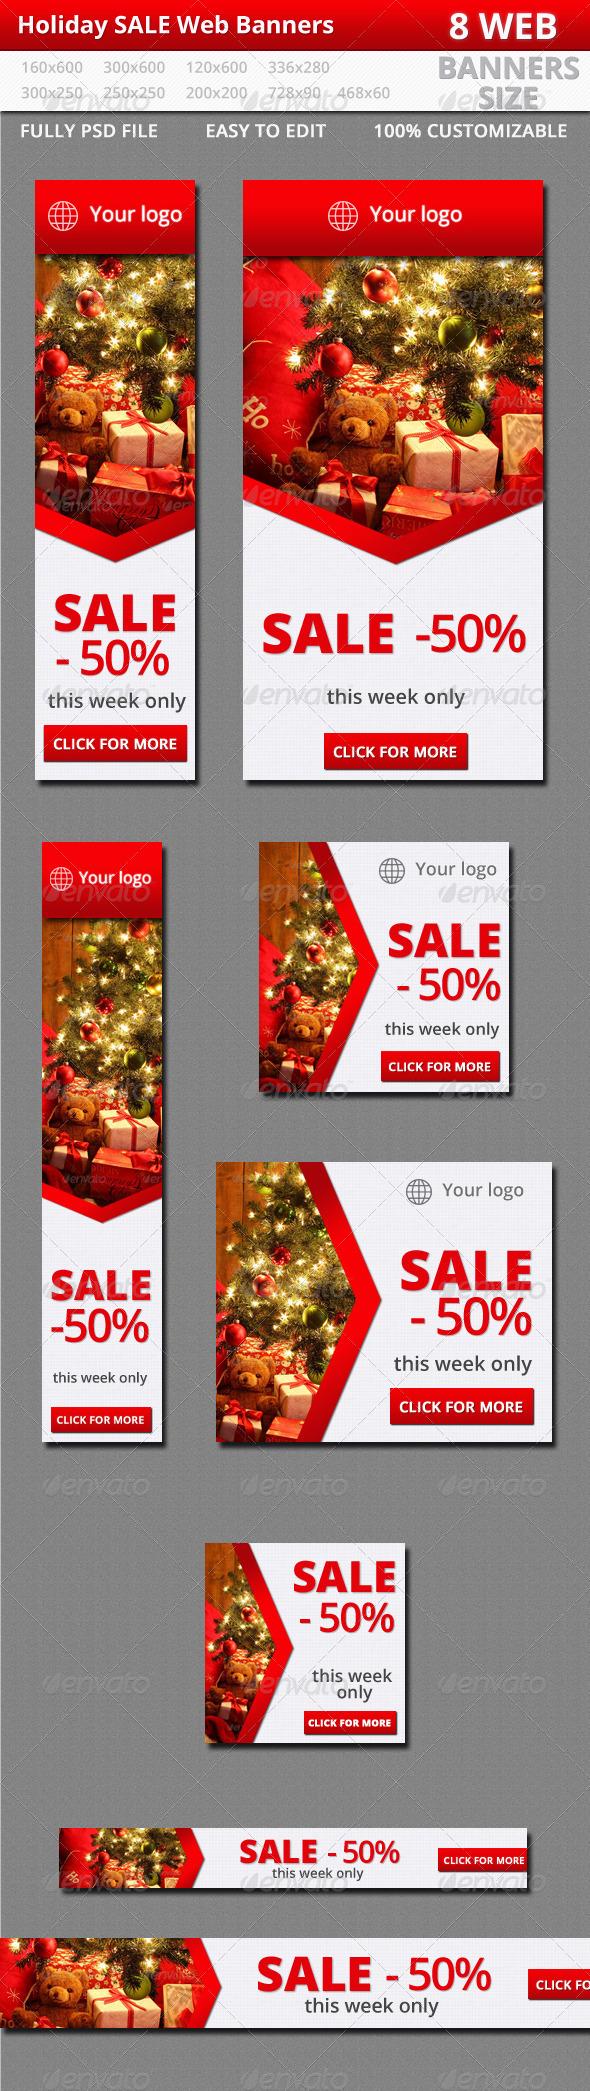 GraphicRiver Sale Web Banners 6363730